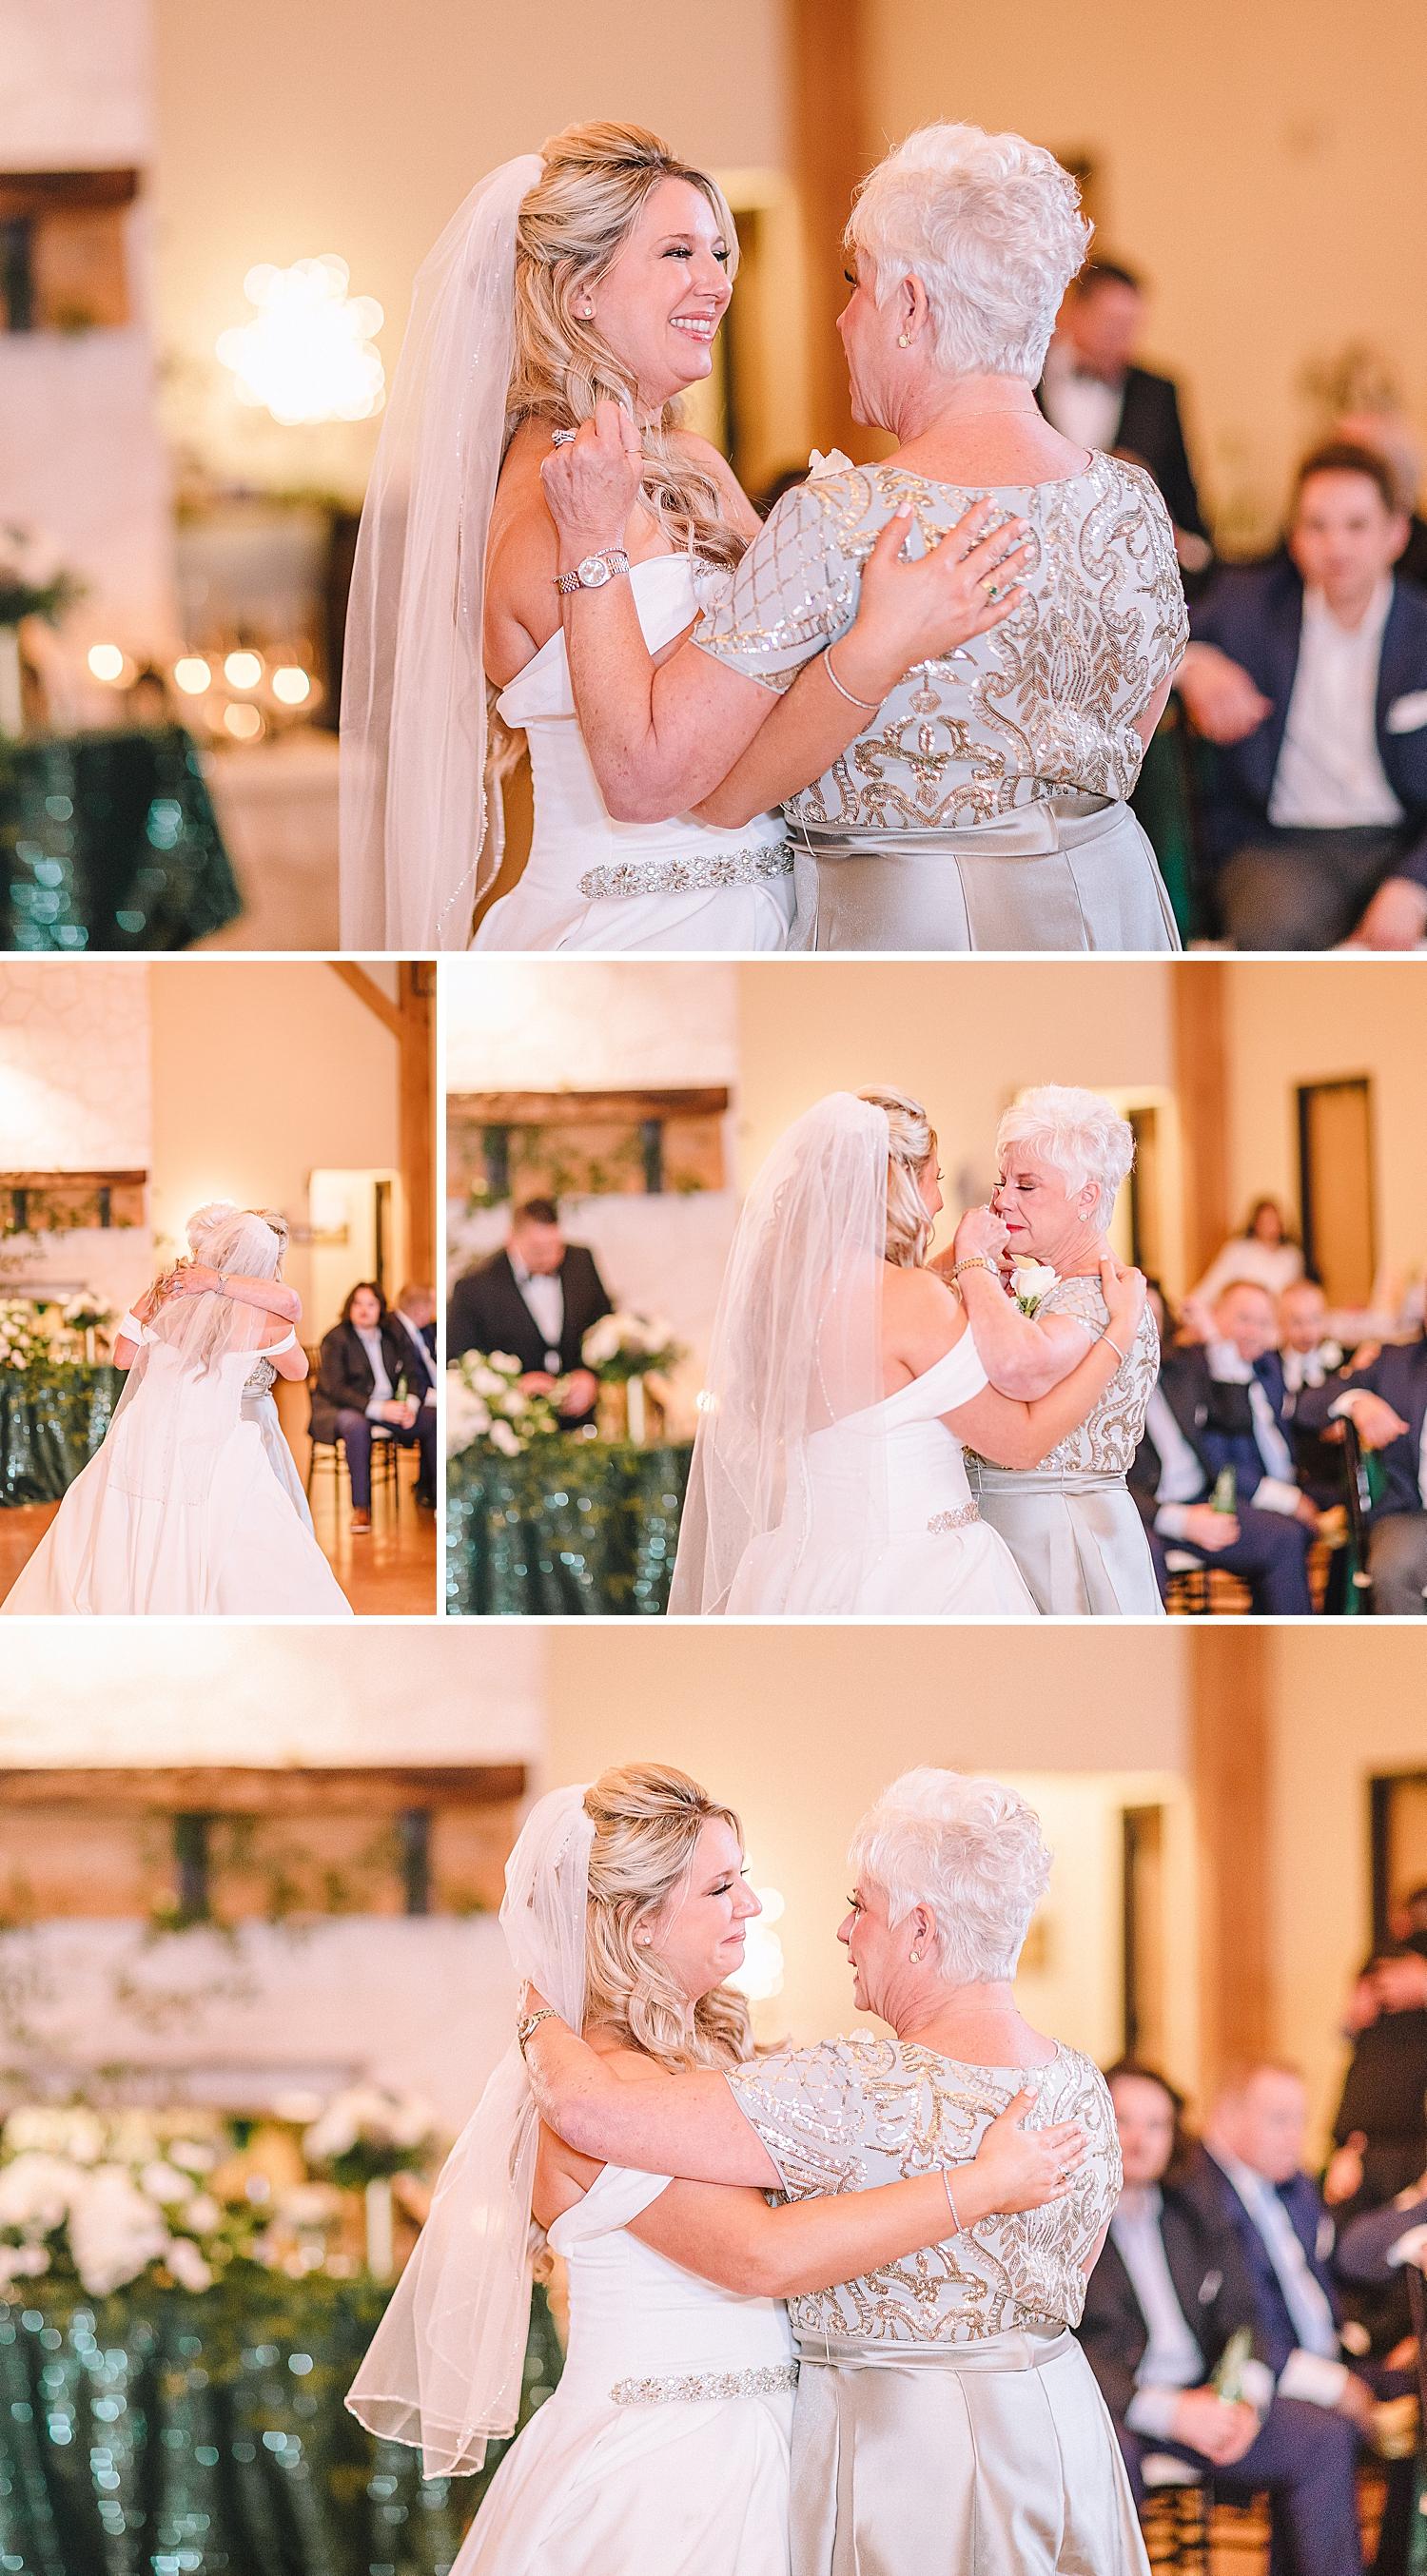 Magnolia-Halle-Wedding-San-Antonio-Texas-Bride-Grom_0079.jpg